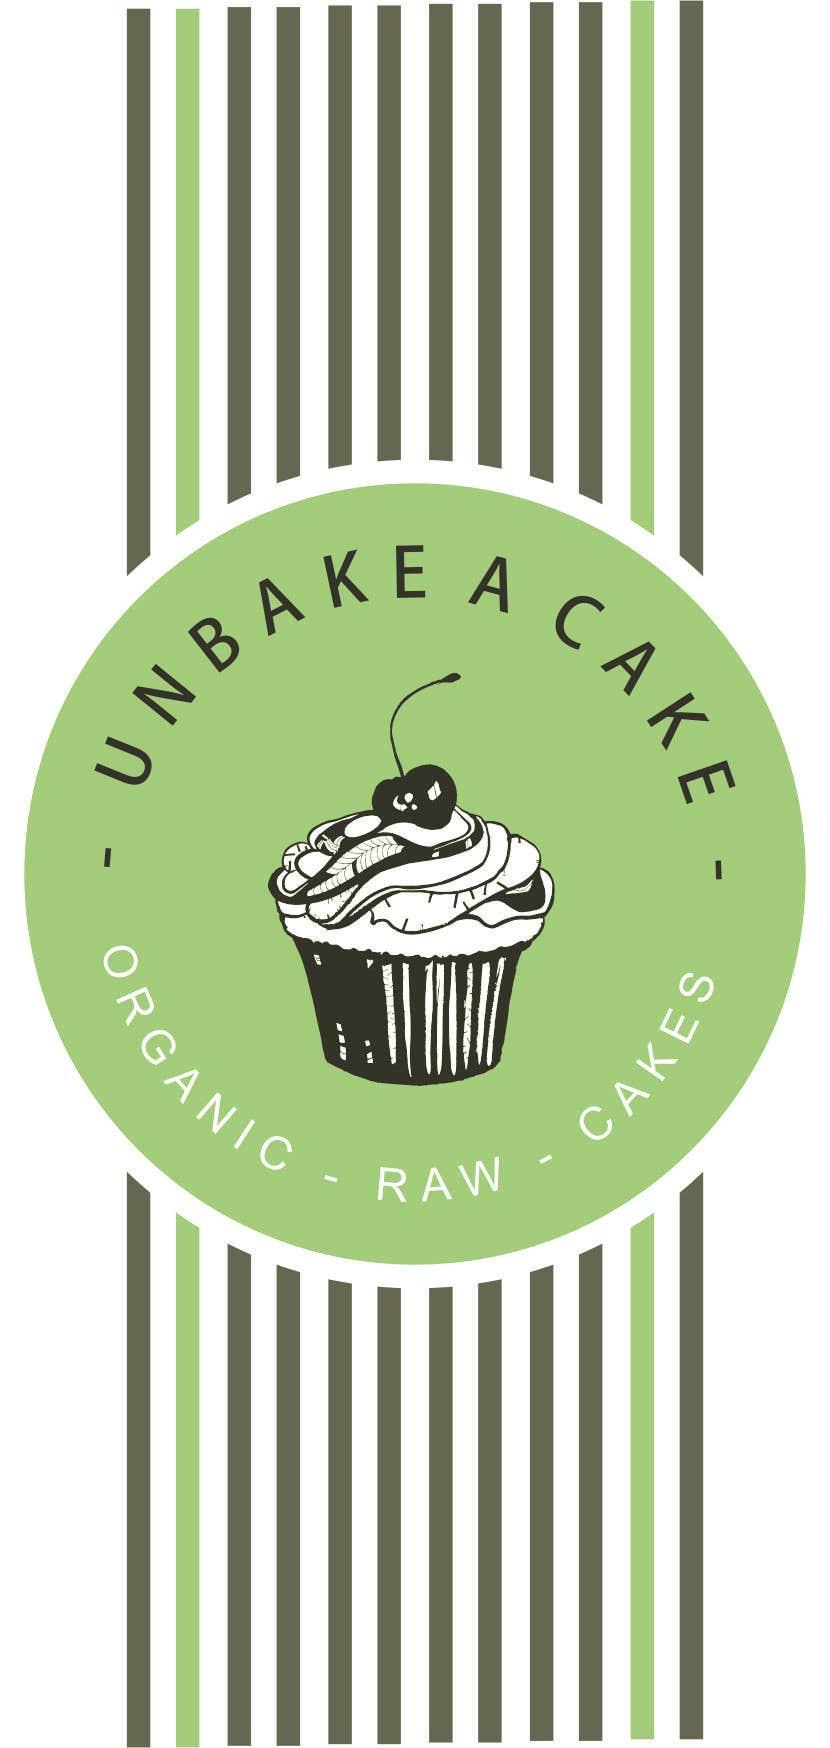 Bài tham dự cuộc thi #                                        48                                      cho                                         Design a Logo for raw organic deserts shop